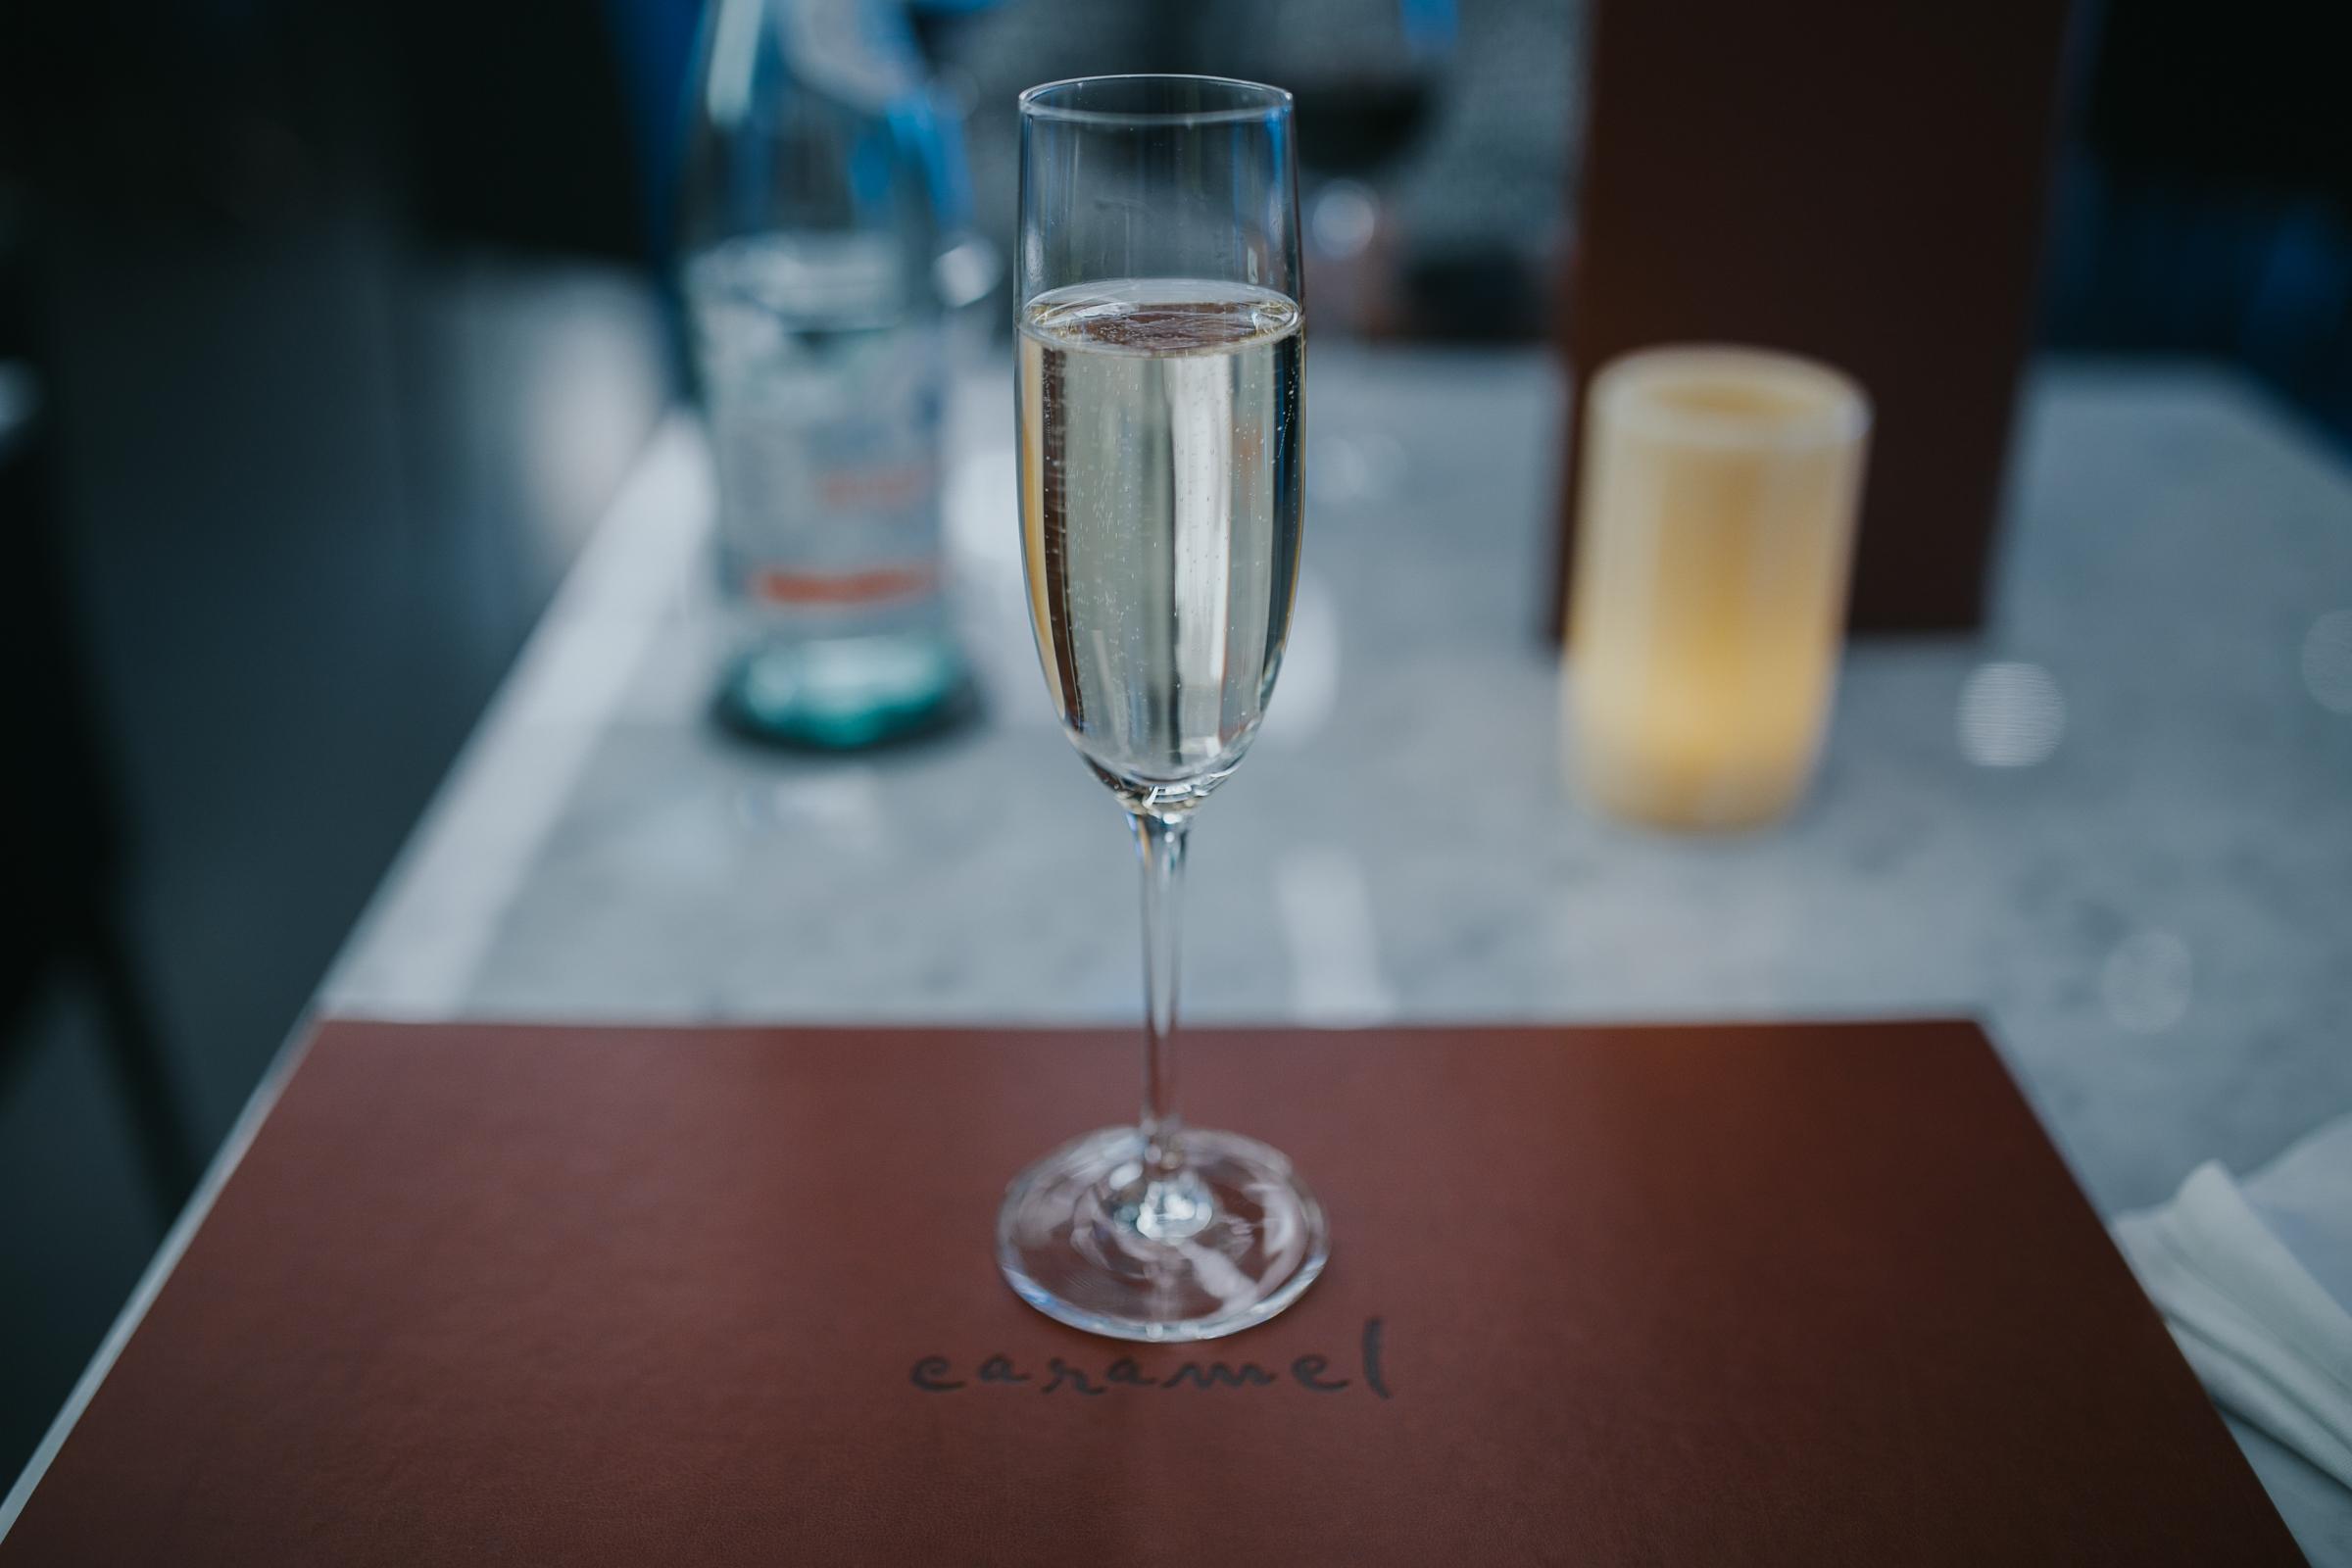 Caramel-restaurant-and-lounge-london-abu-dabi-dubai-oman-new-restaurant-in-london-minas-planet-review-jasmina-haskovic9.jpg